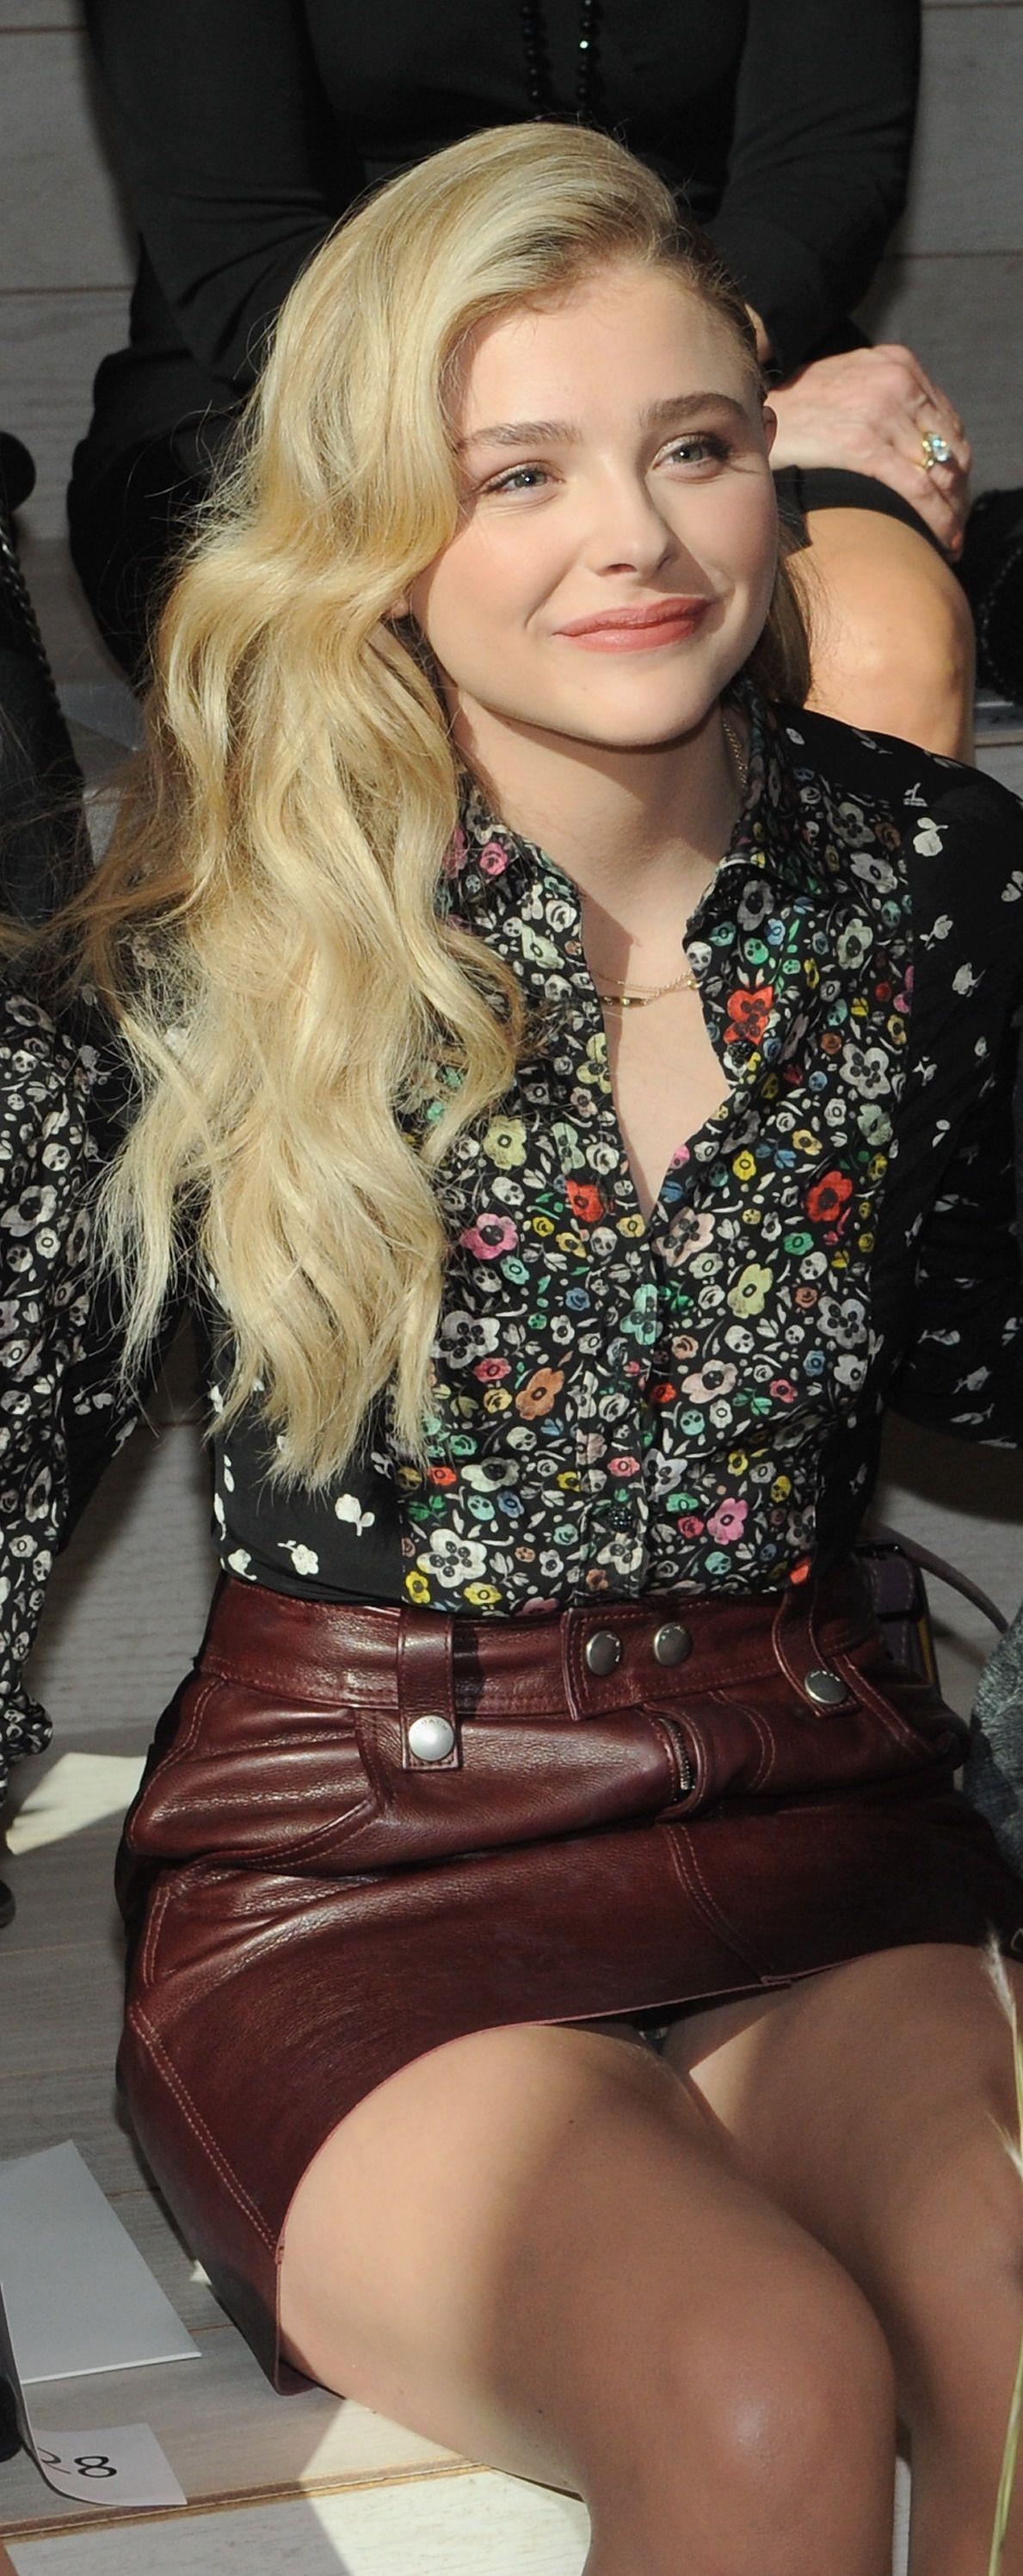 Chloe Grace Moretz Upskirt (6 Photos)